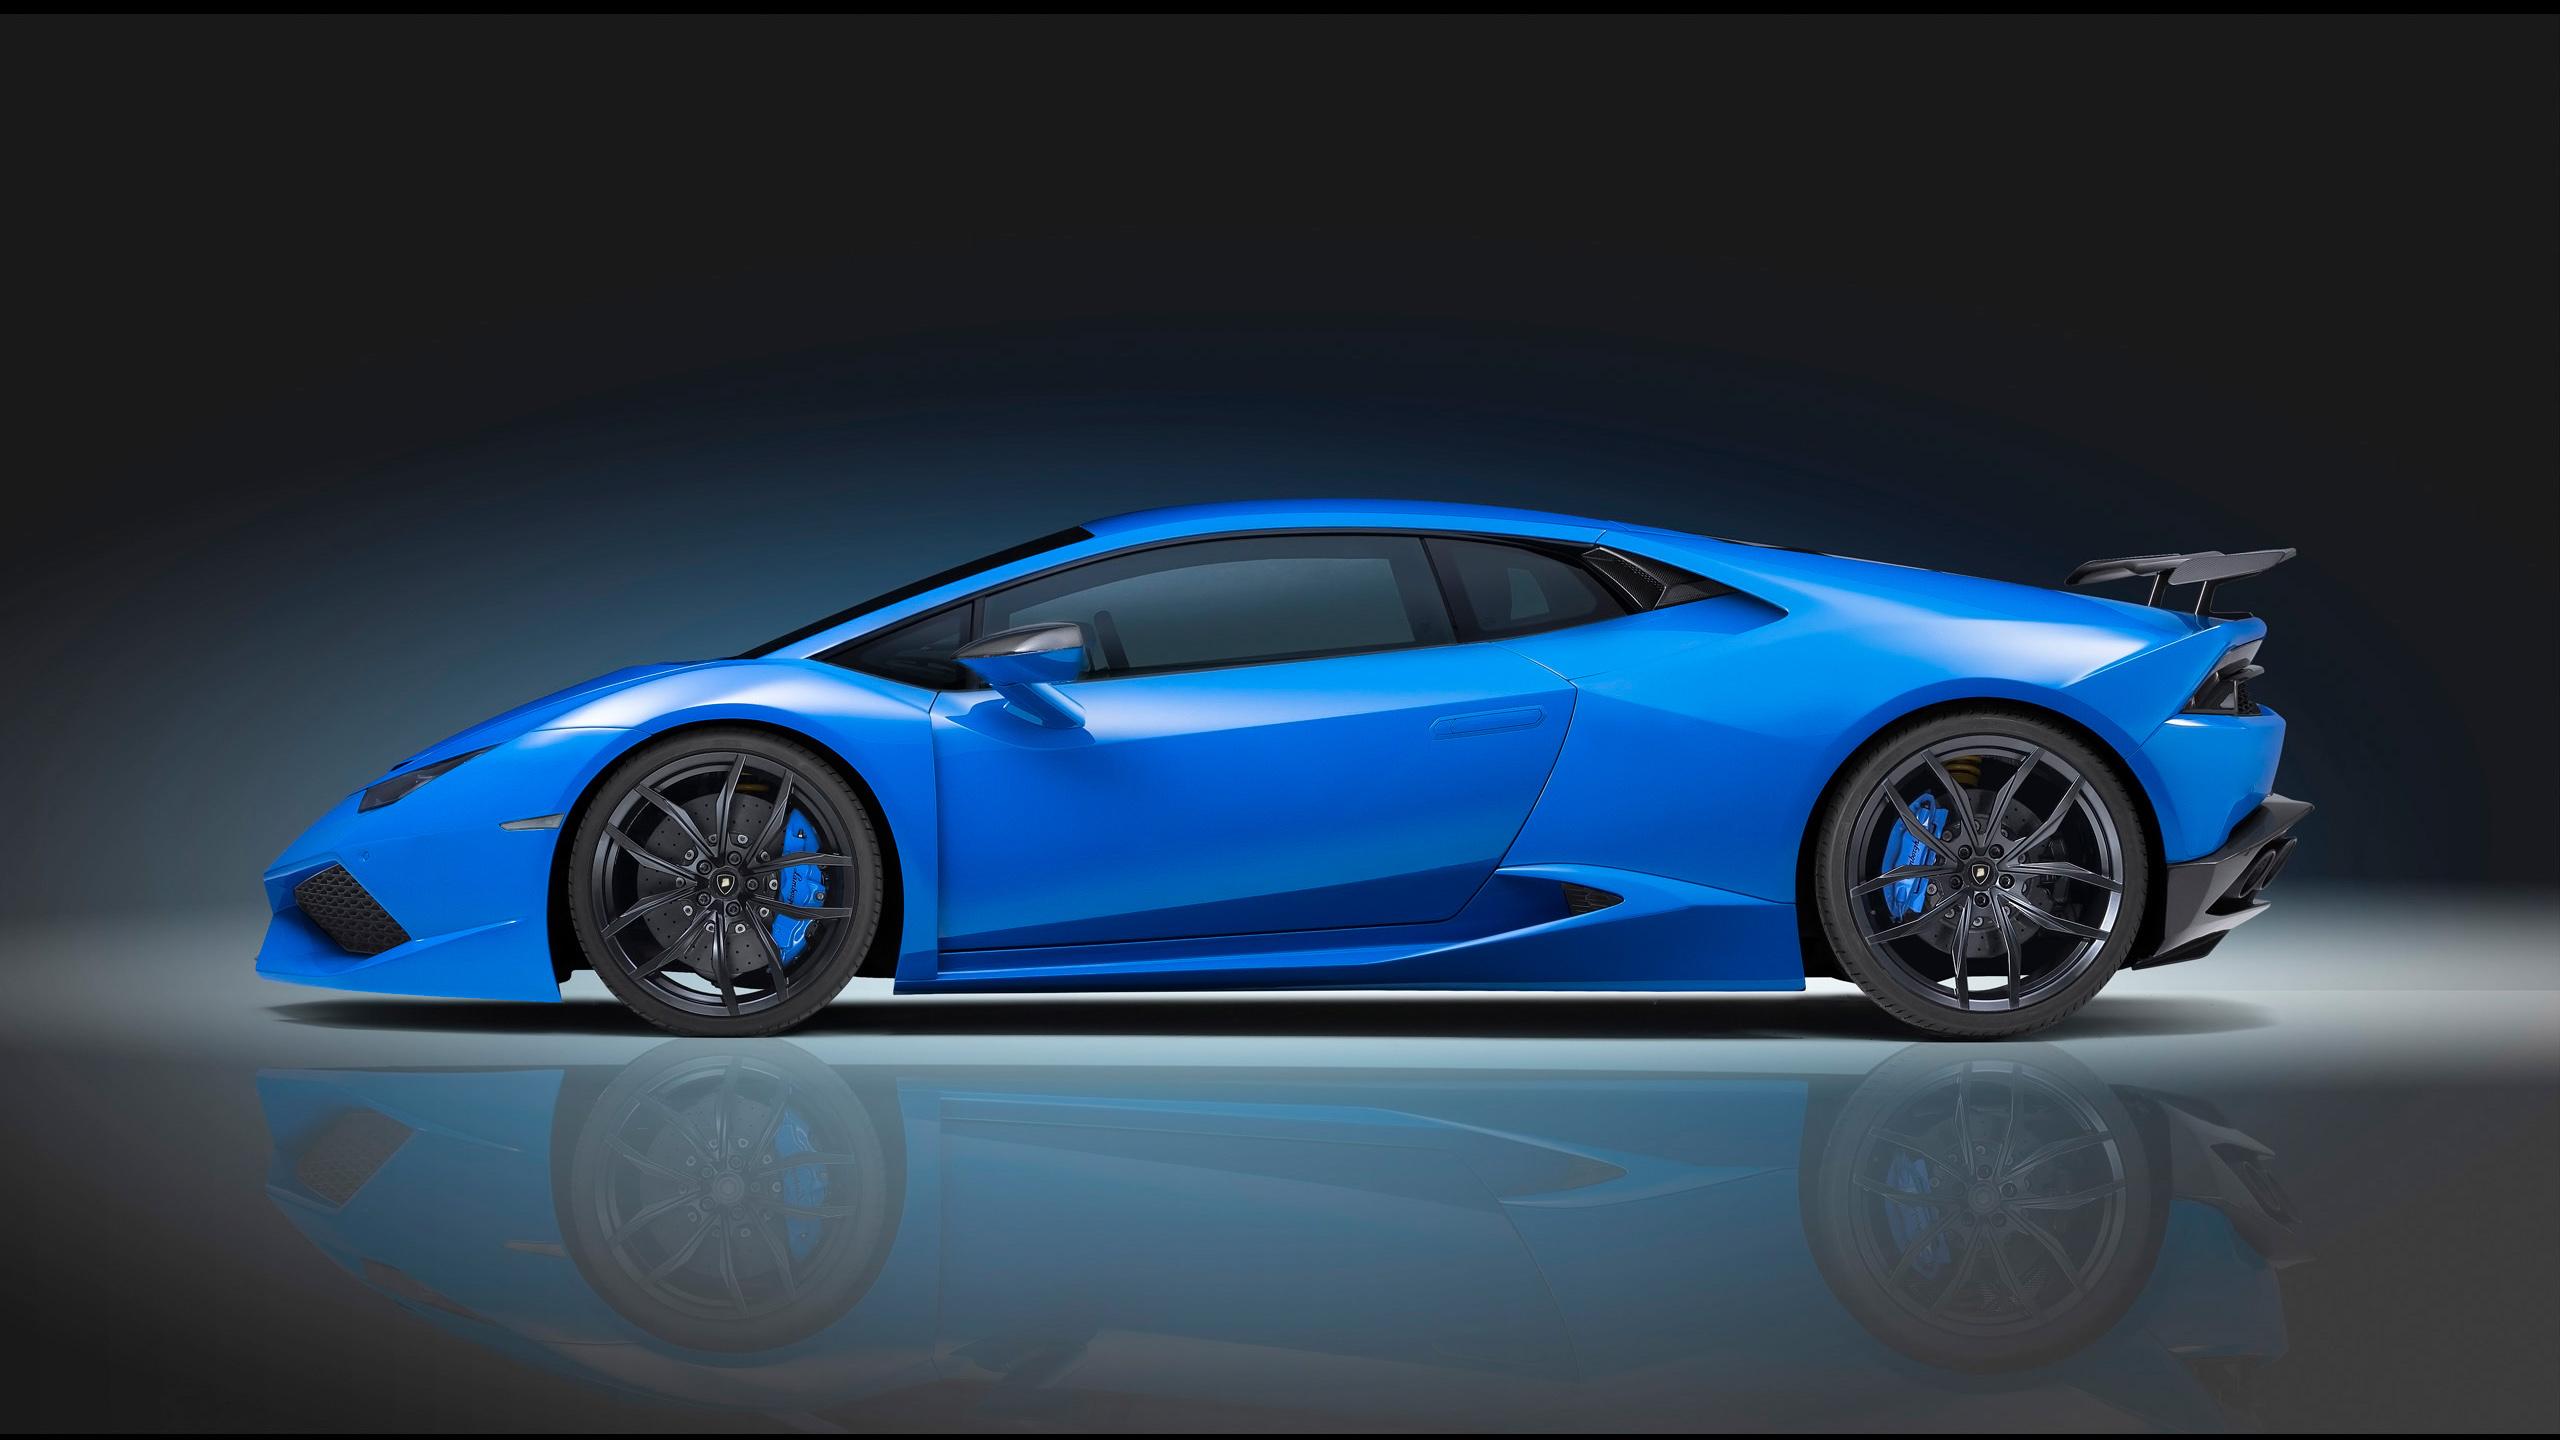 2015 Novitec Torado Lamborghini Huracan N Largo 3 Wallpaper HD 2560x1440